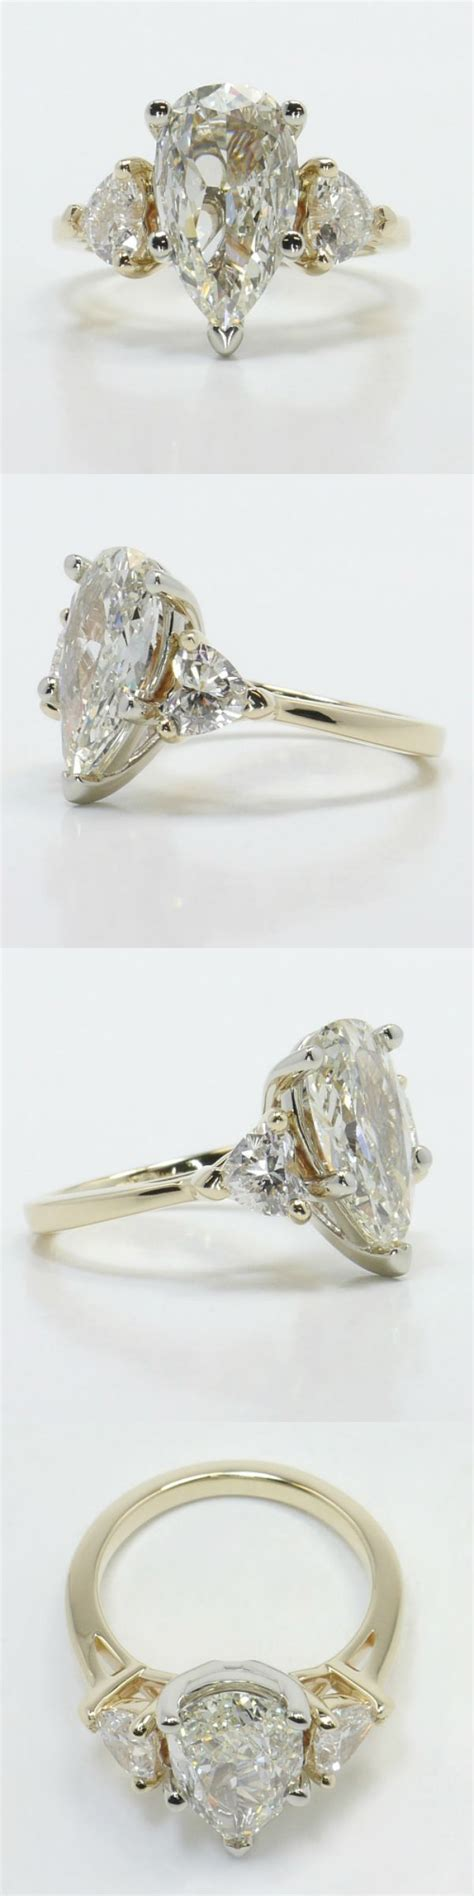 unique financing an engagement ring calculator matvuk com